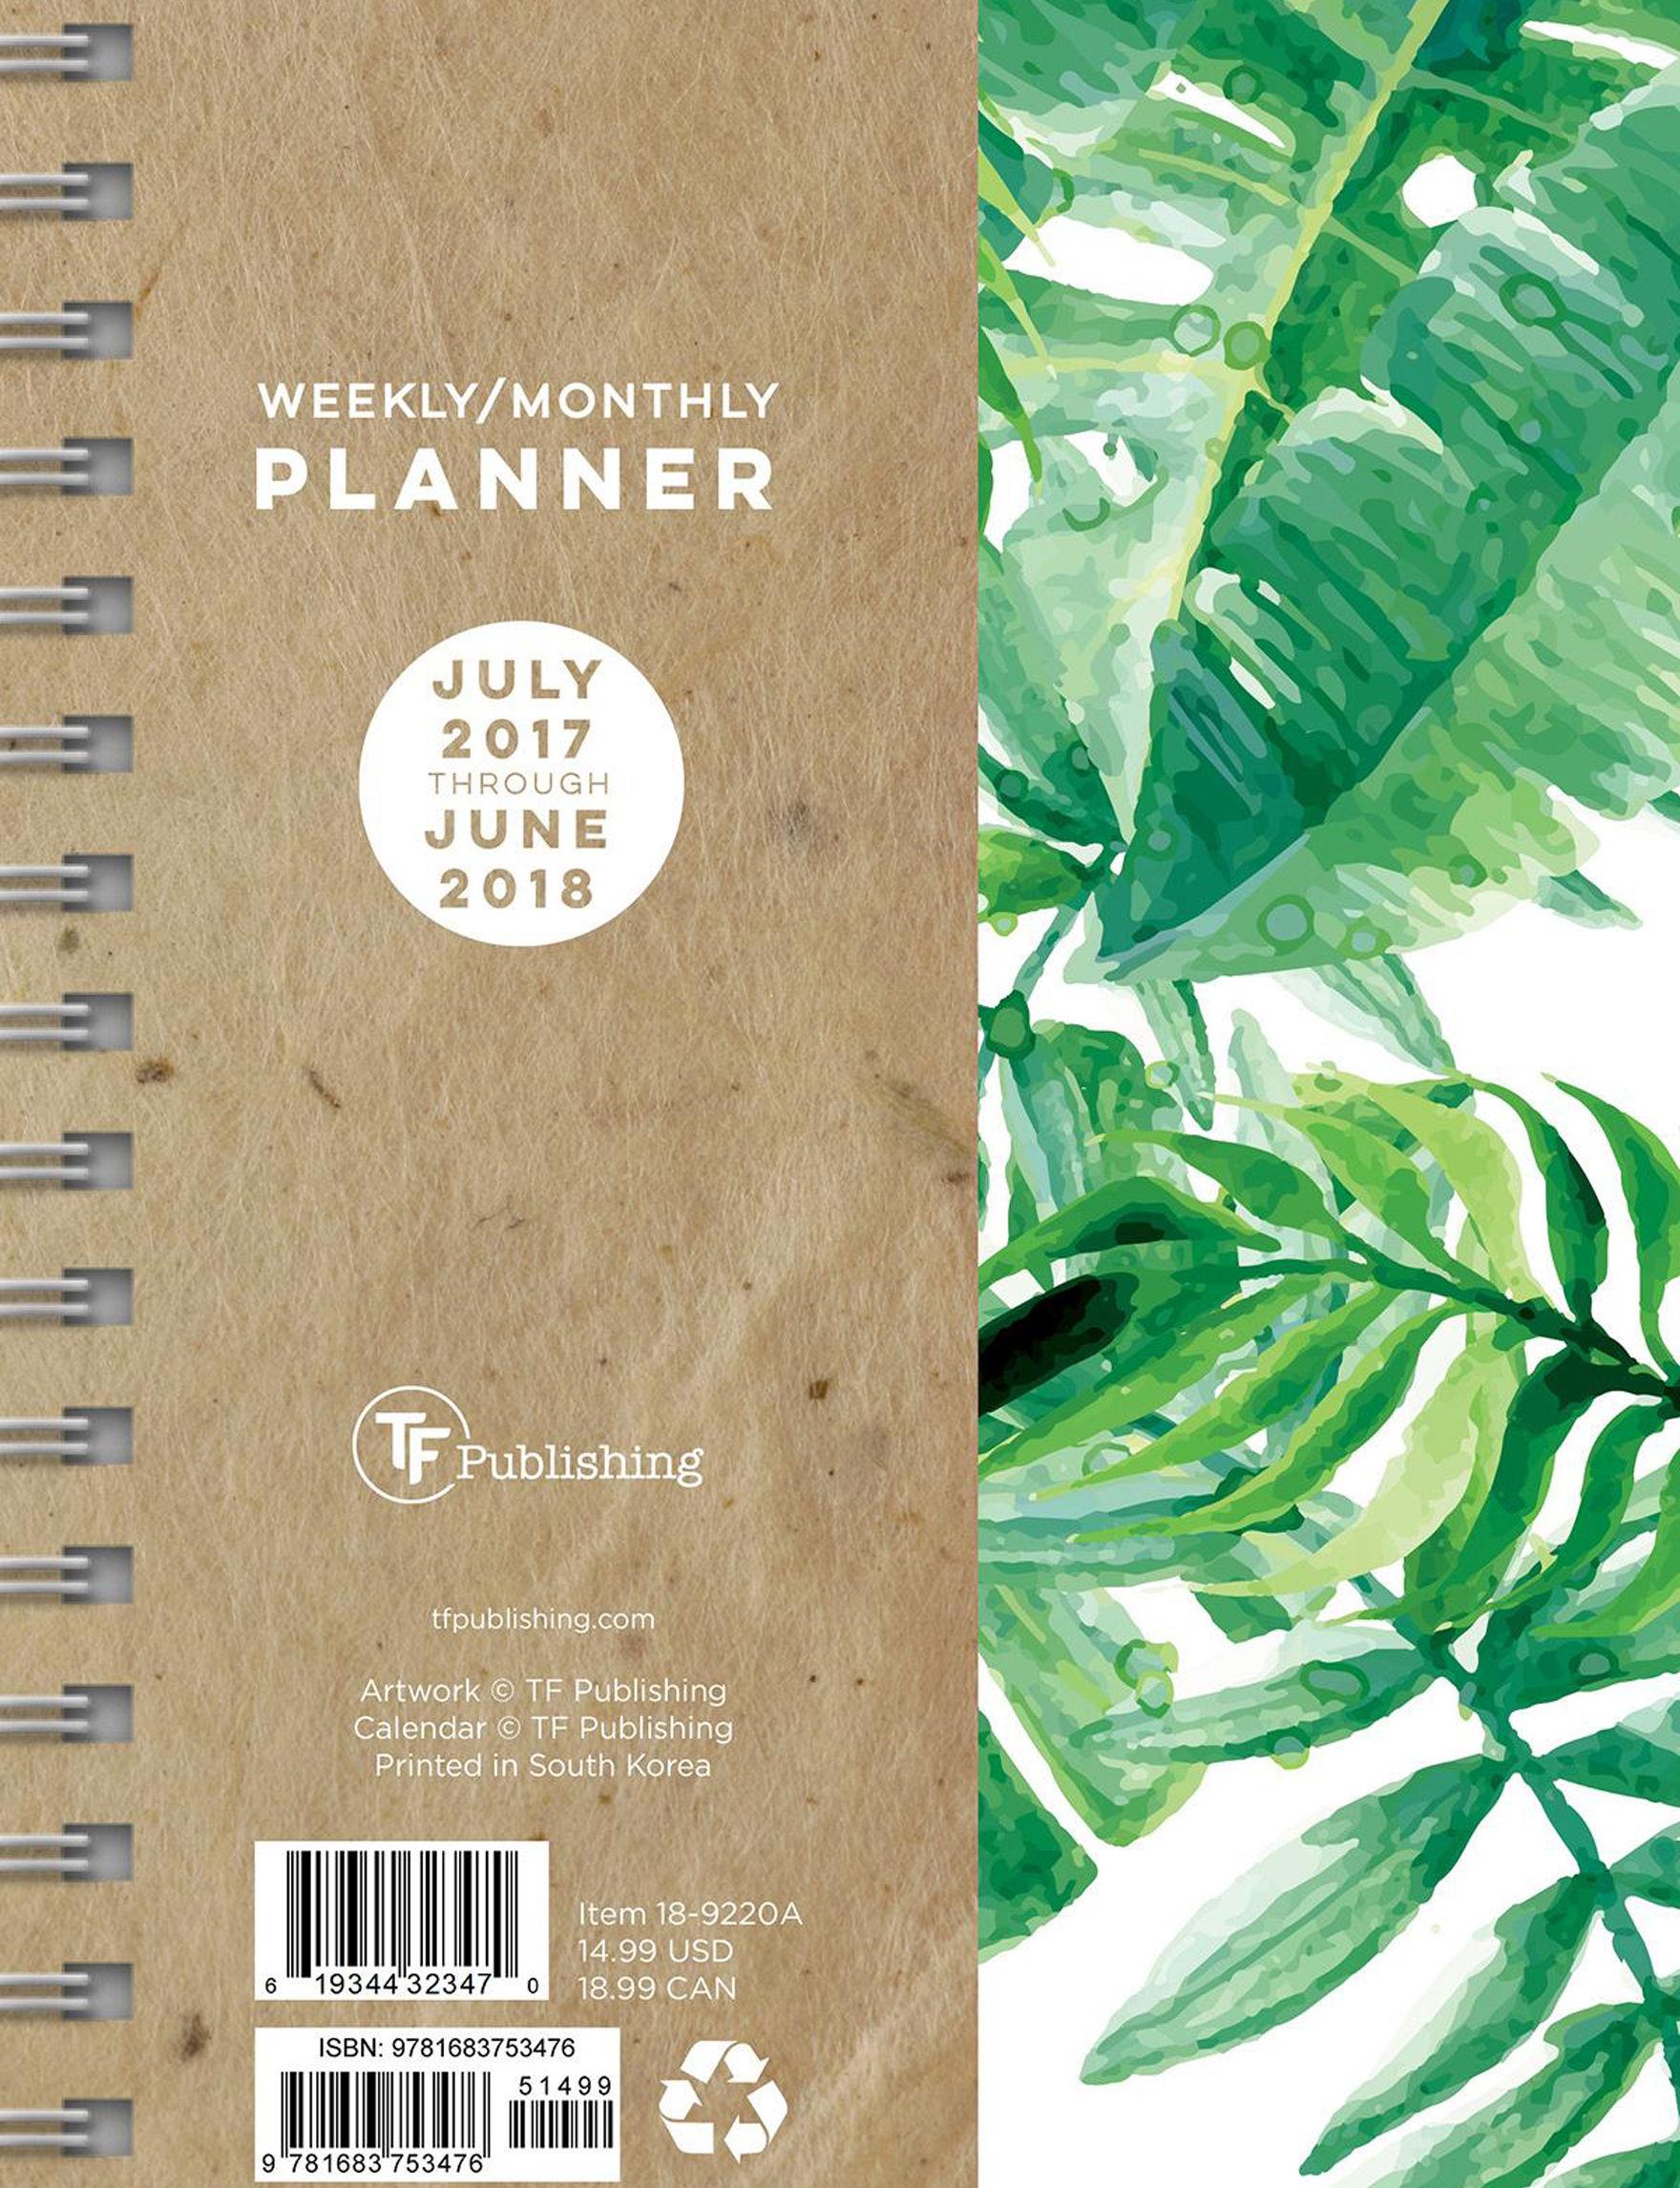 TFI Publishing Green Stationary School & Office Supplies